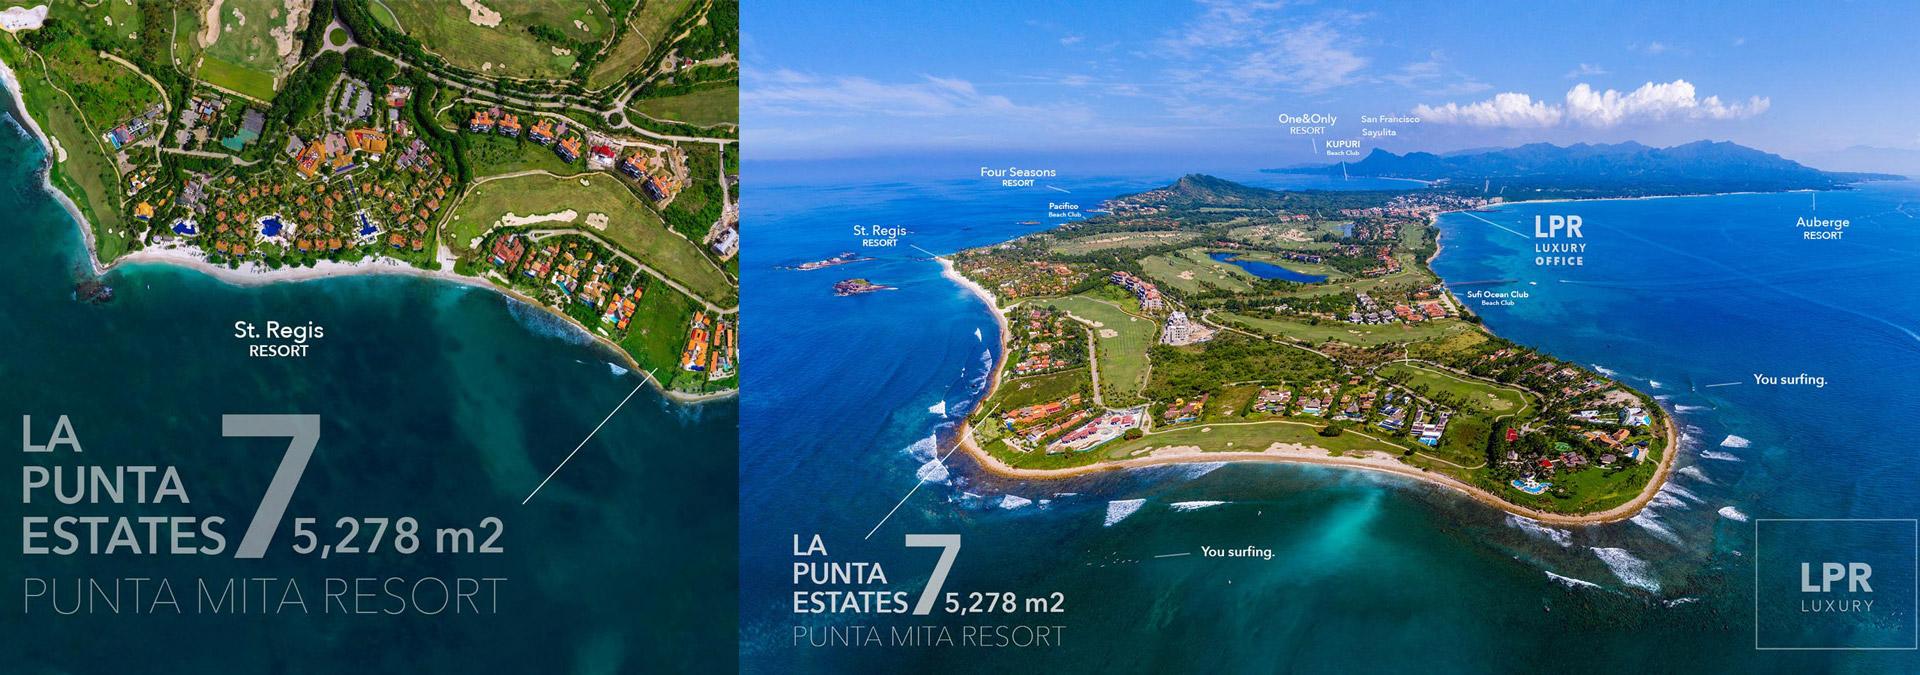 La Punta Estates - Lot 7 at the Punta Mita Resort - Puerto Vallarta Mexico